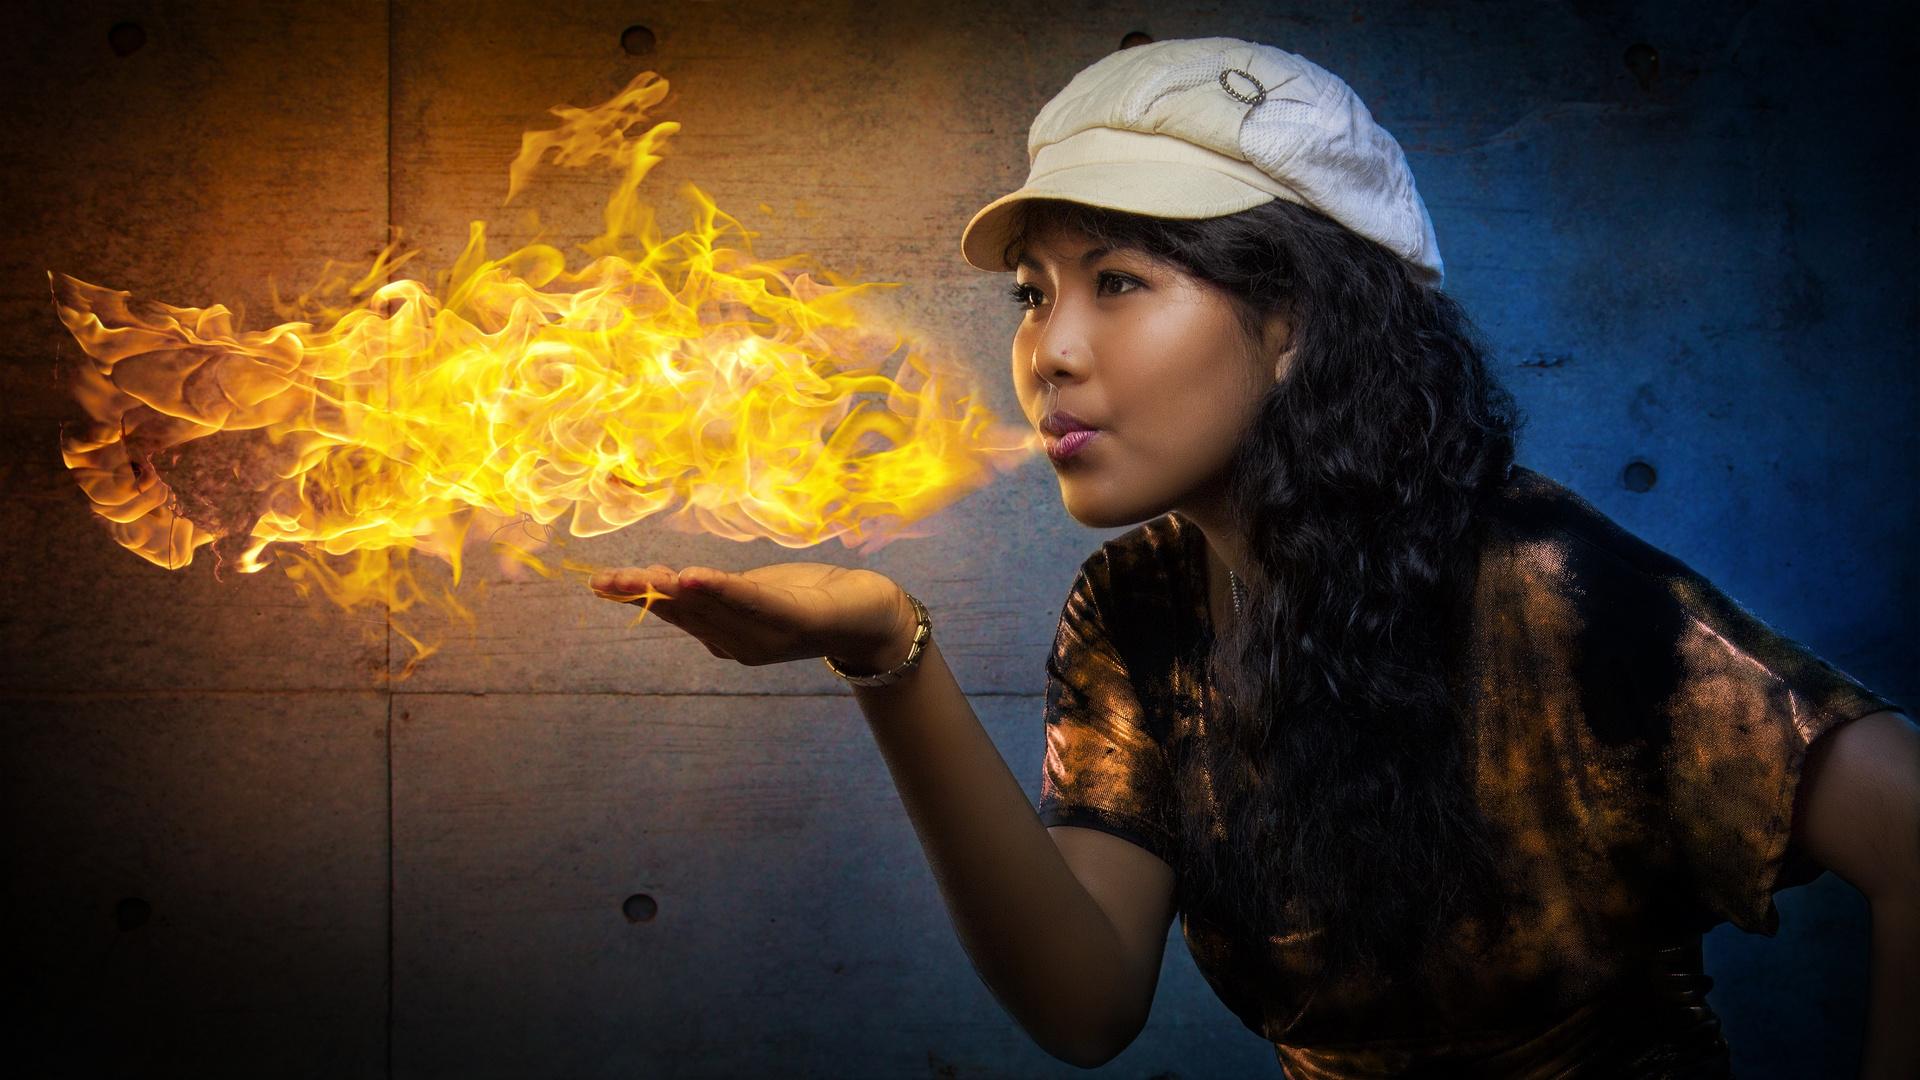 Sherida die Feuerschluckerin